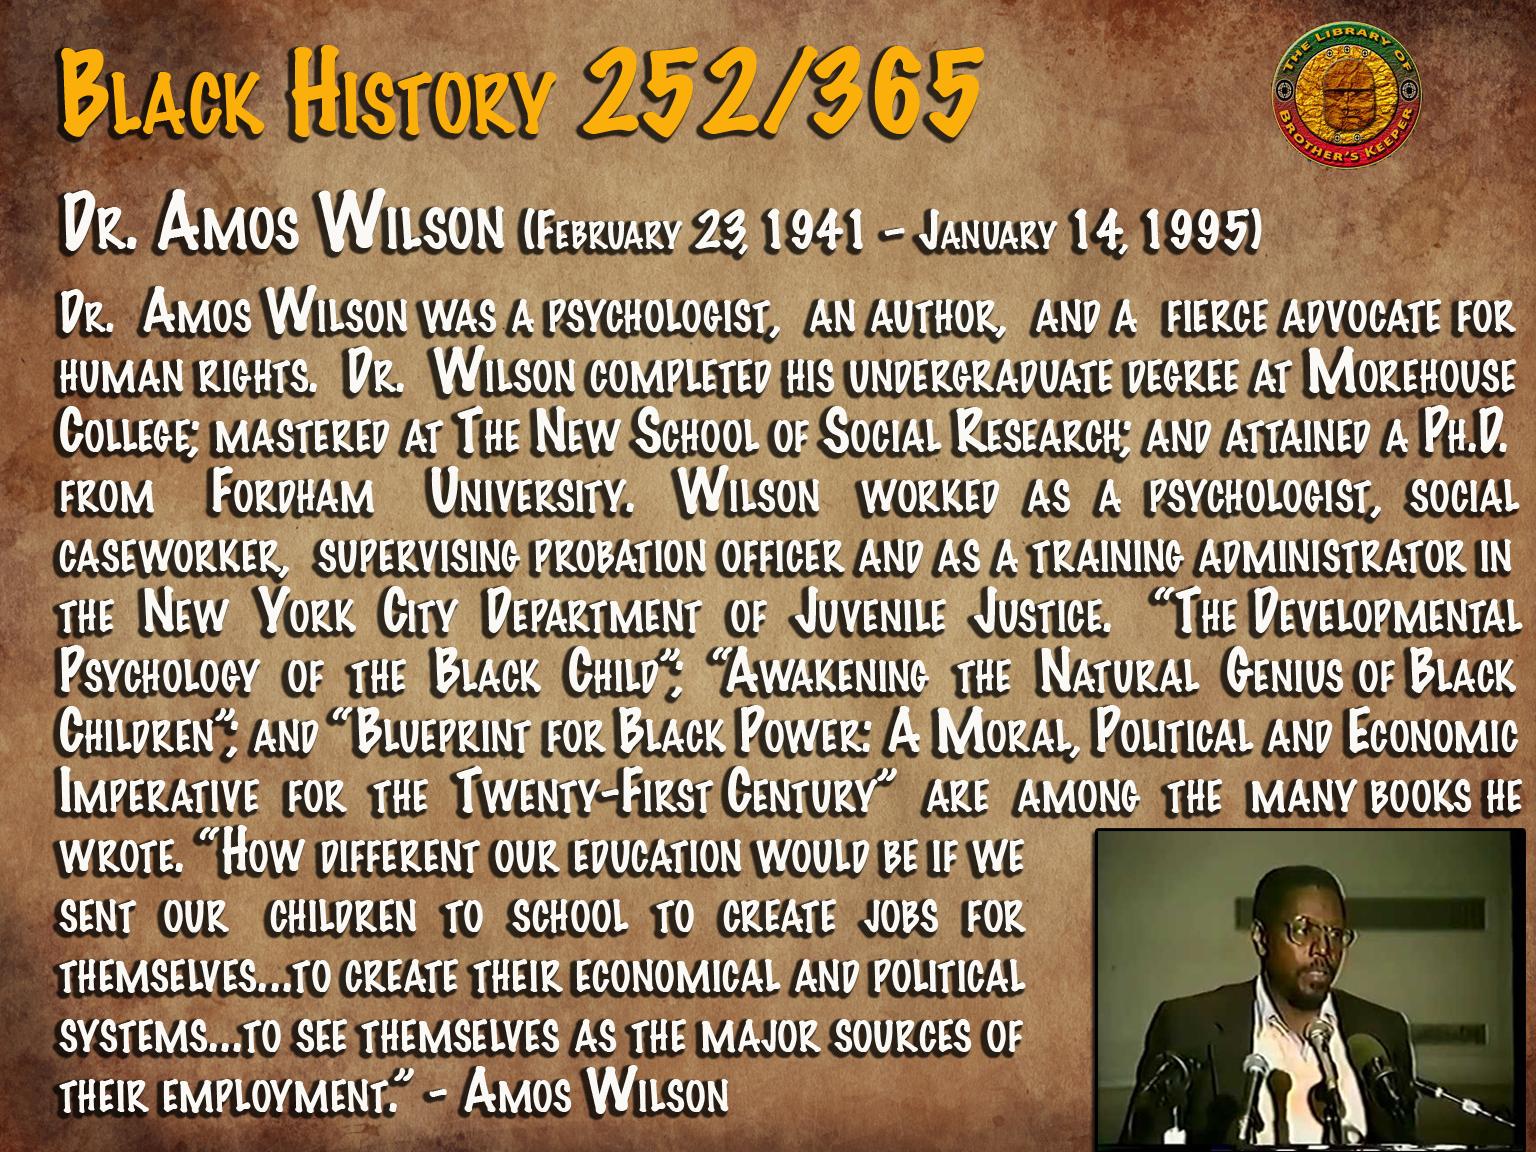 Amos Wilson